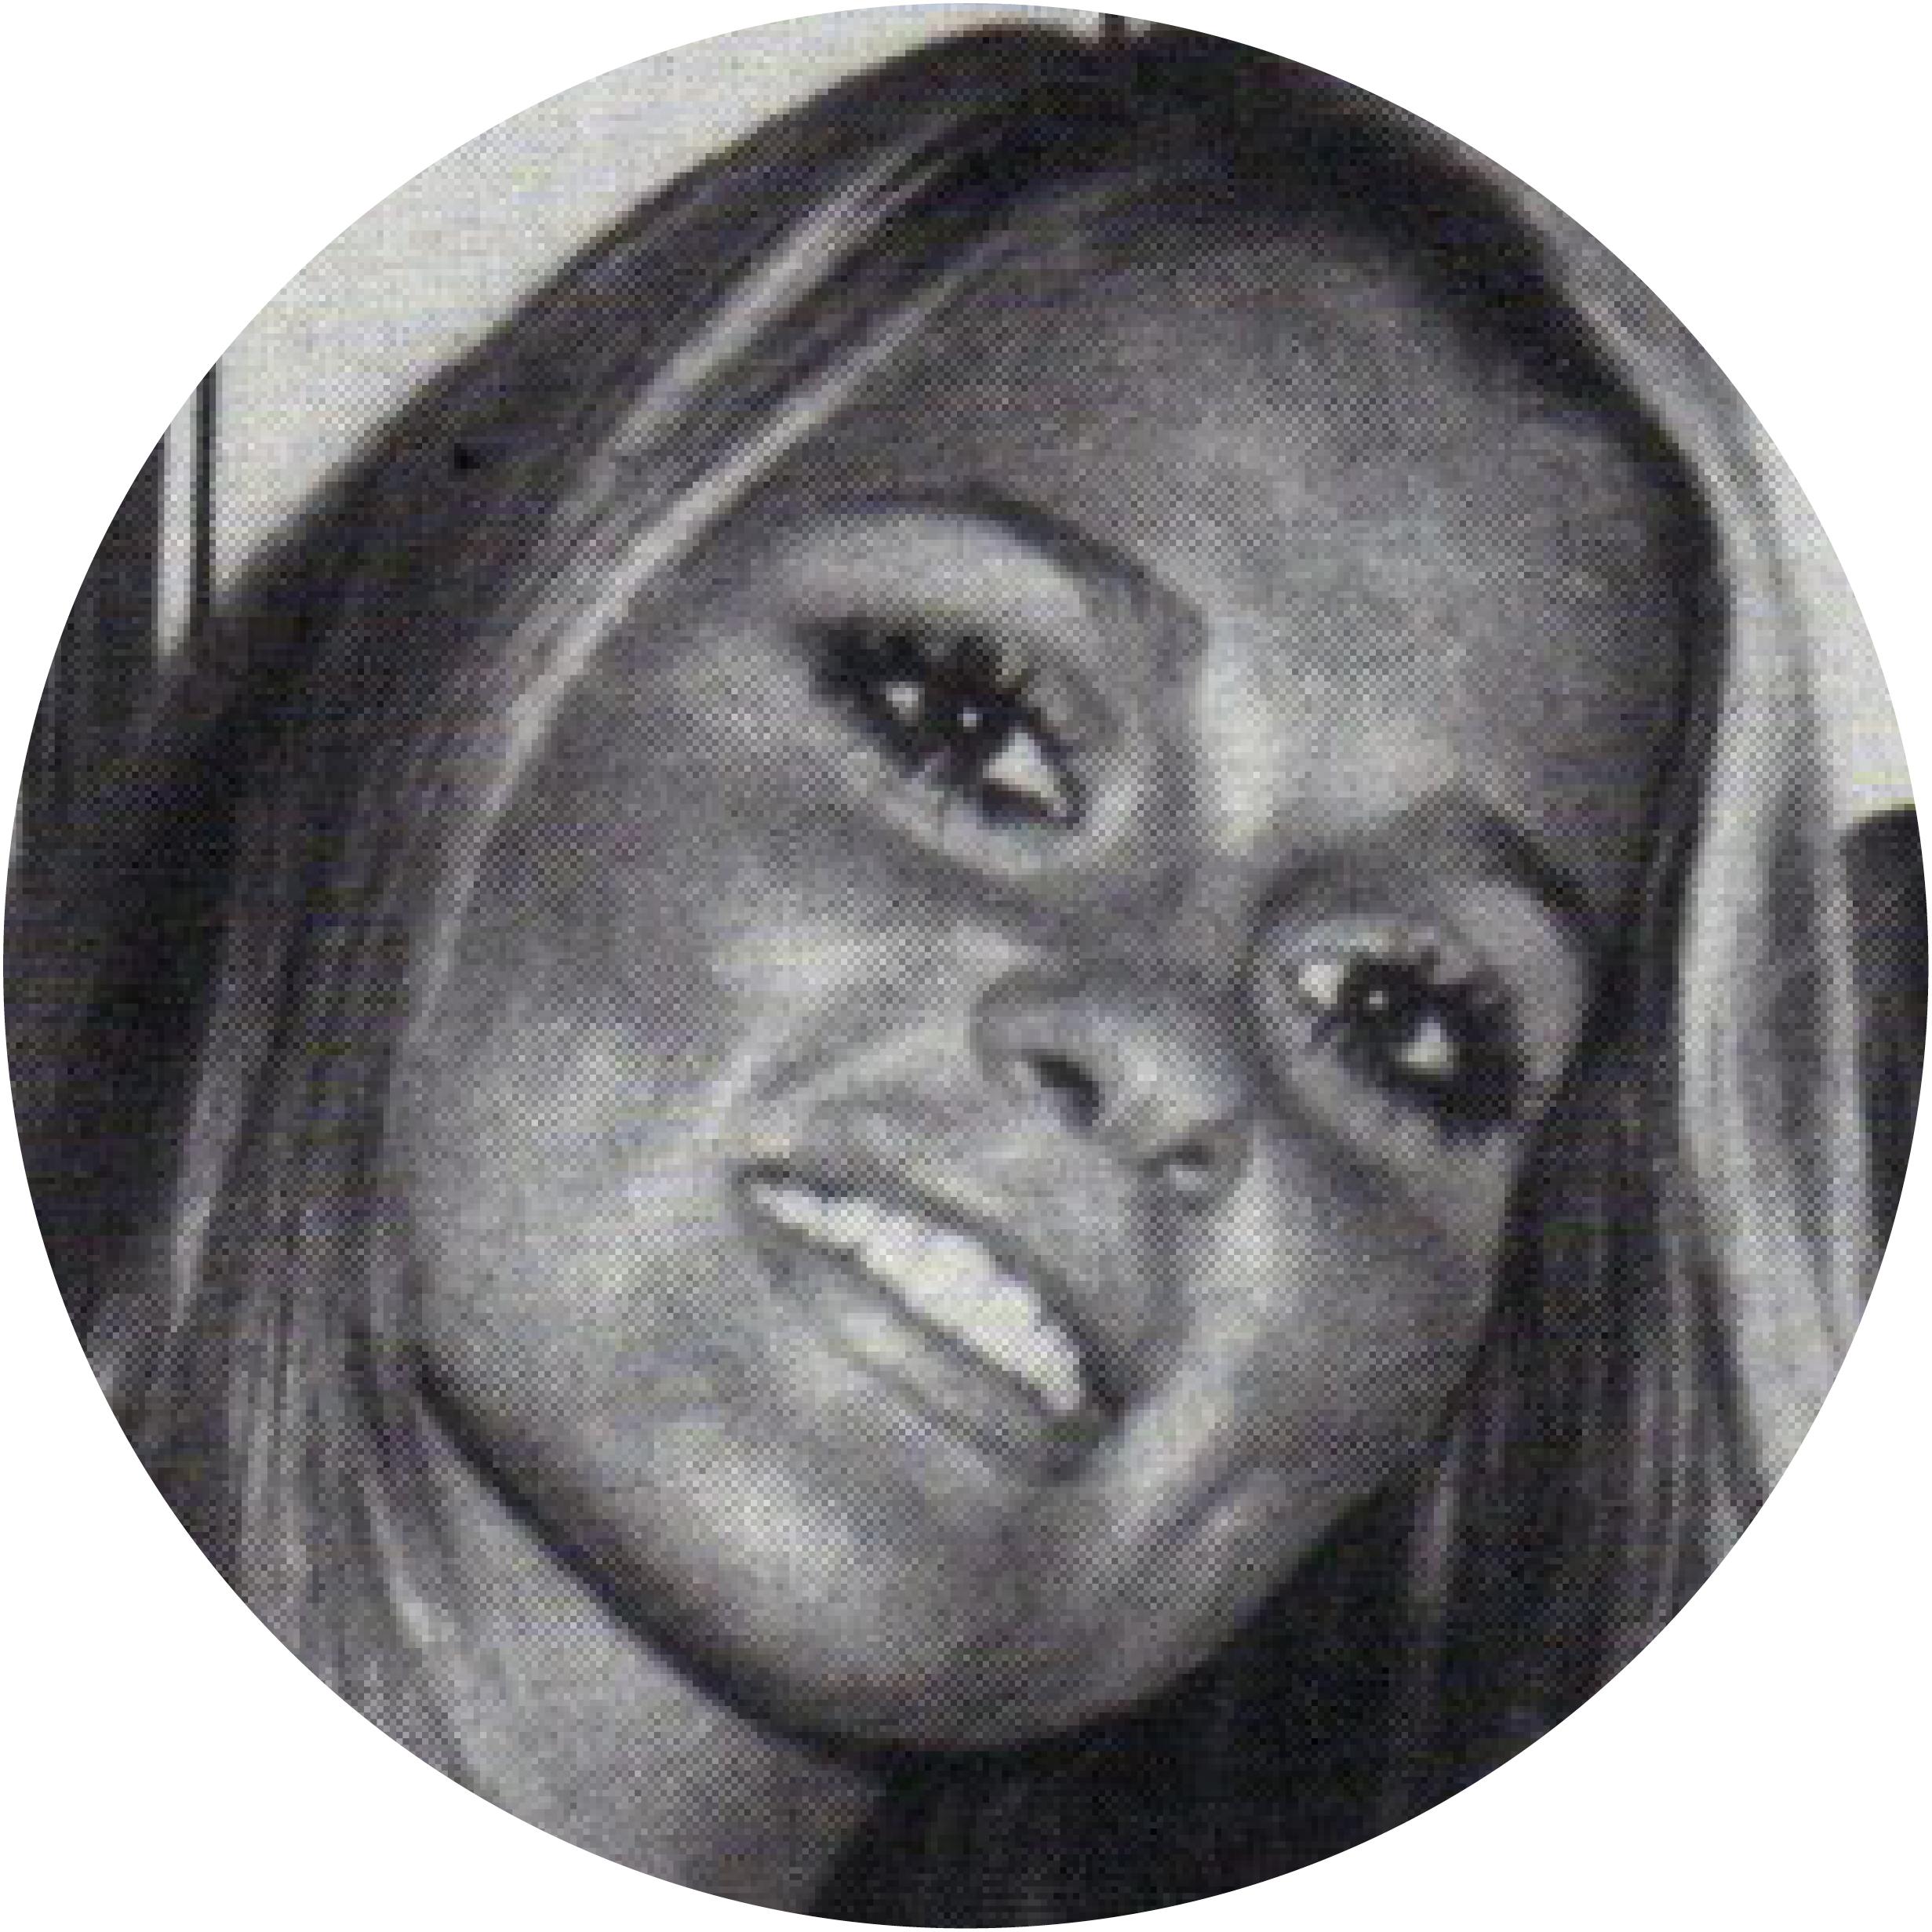 Jillian Jessup